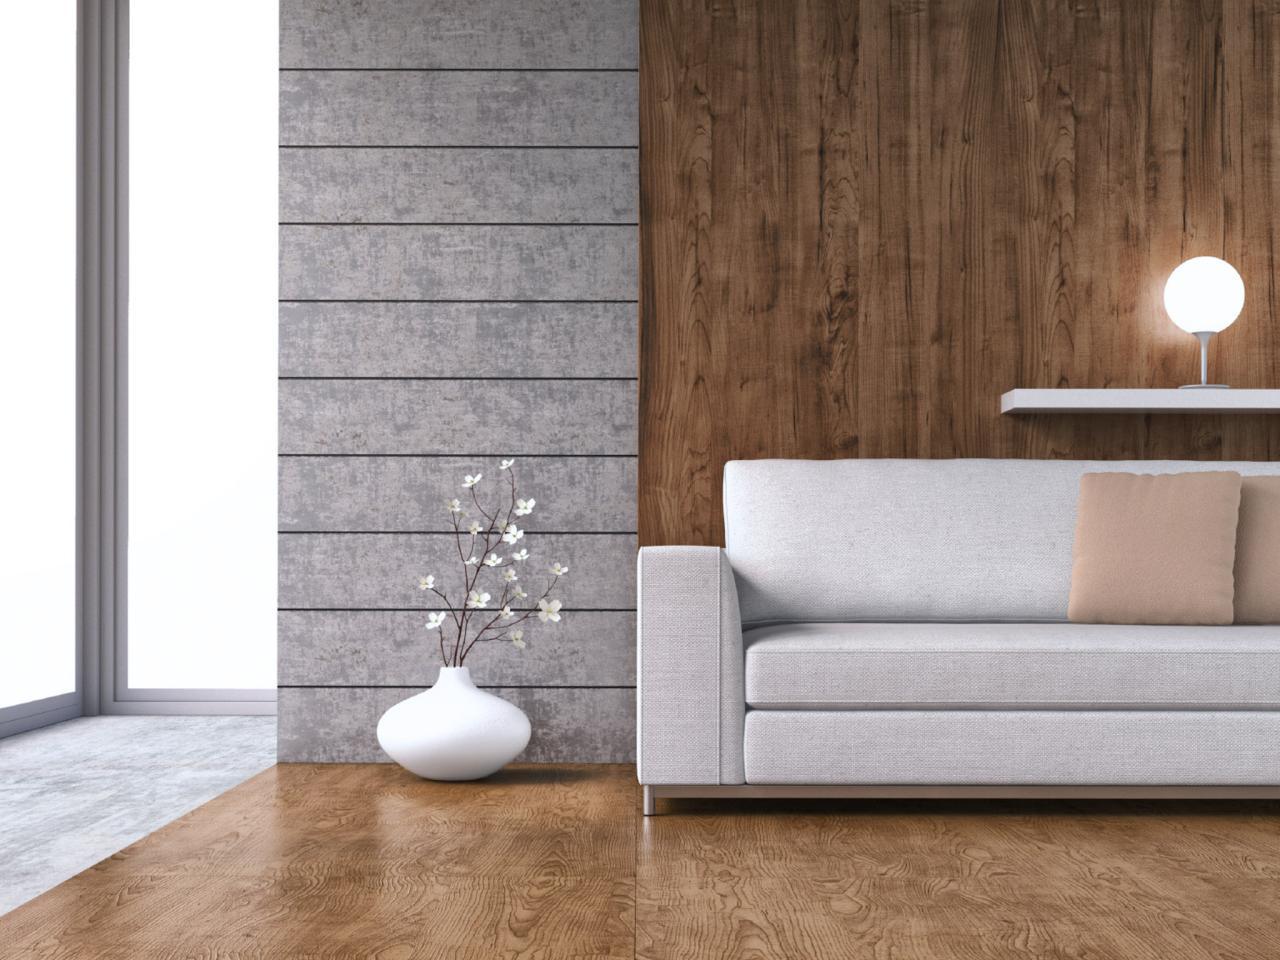 flooring ideas for any space OPXLVLJ